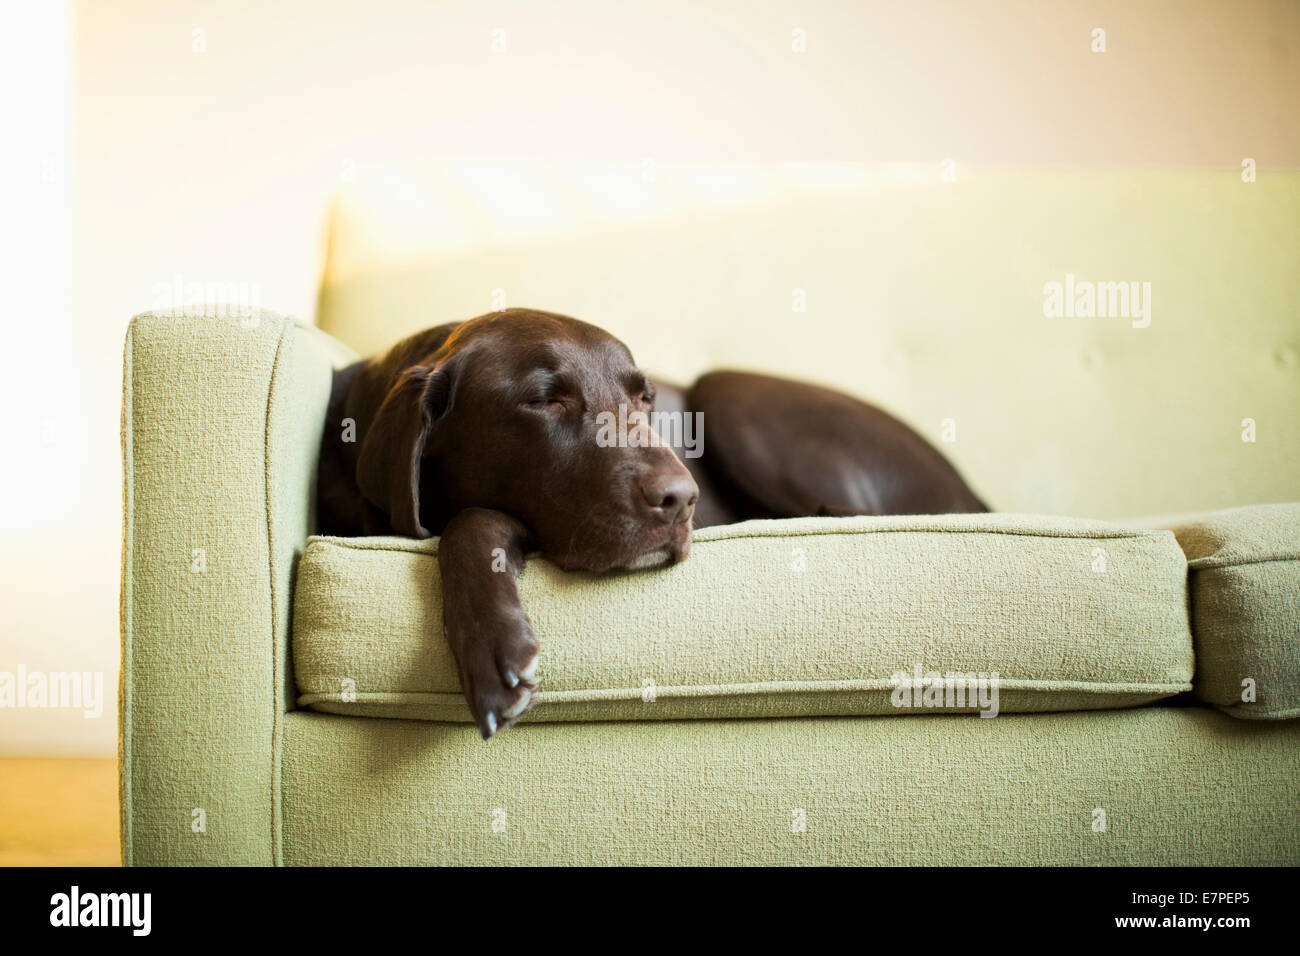 Chocolate Labrador resting on sofa - Stock Image